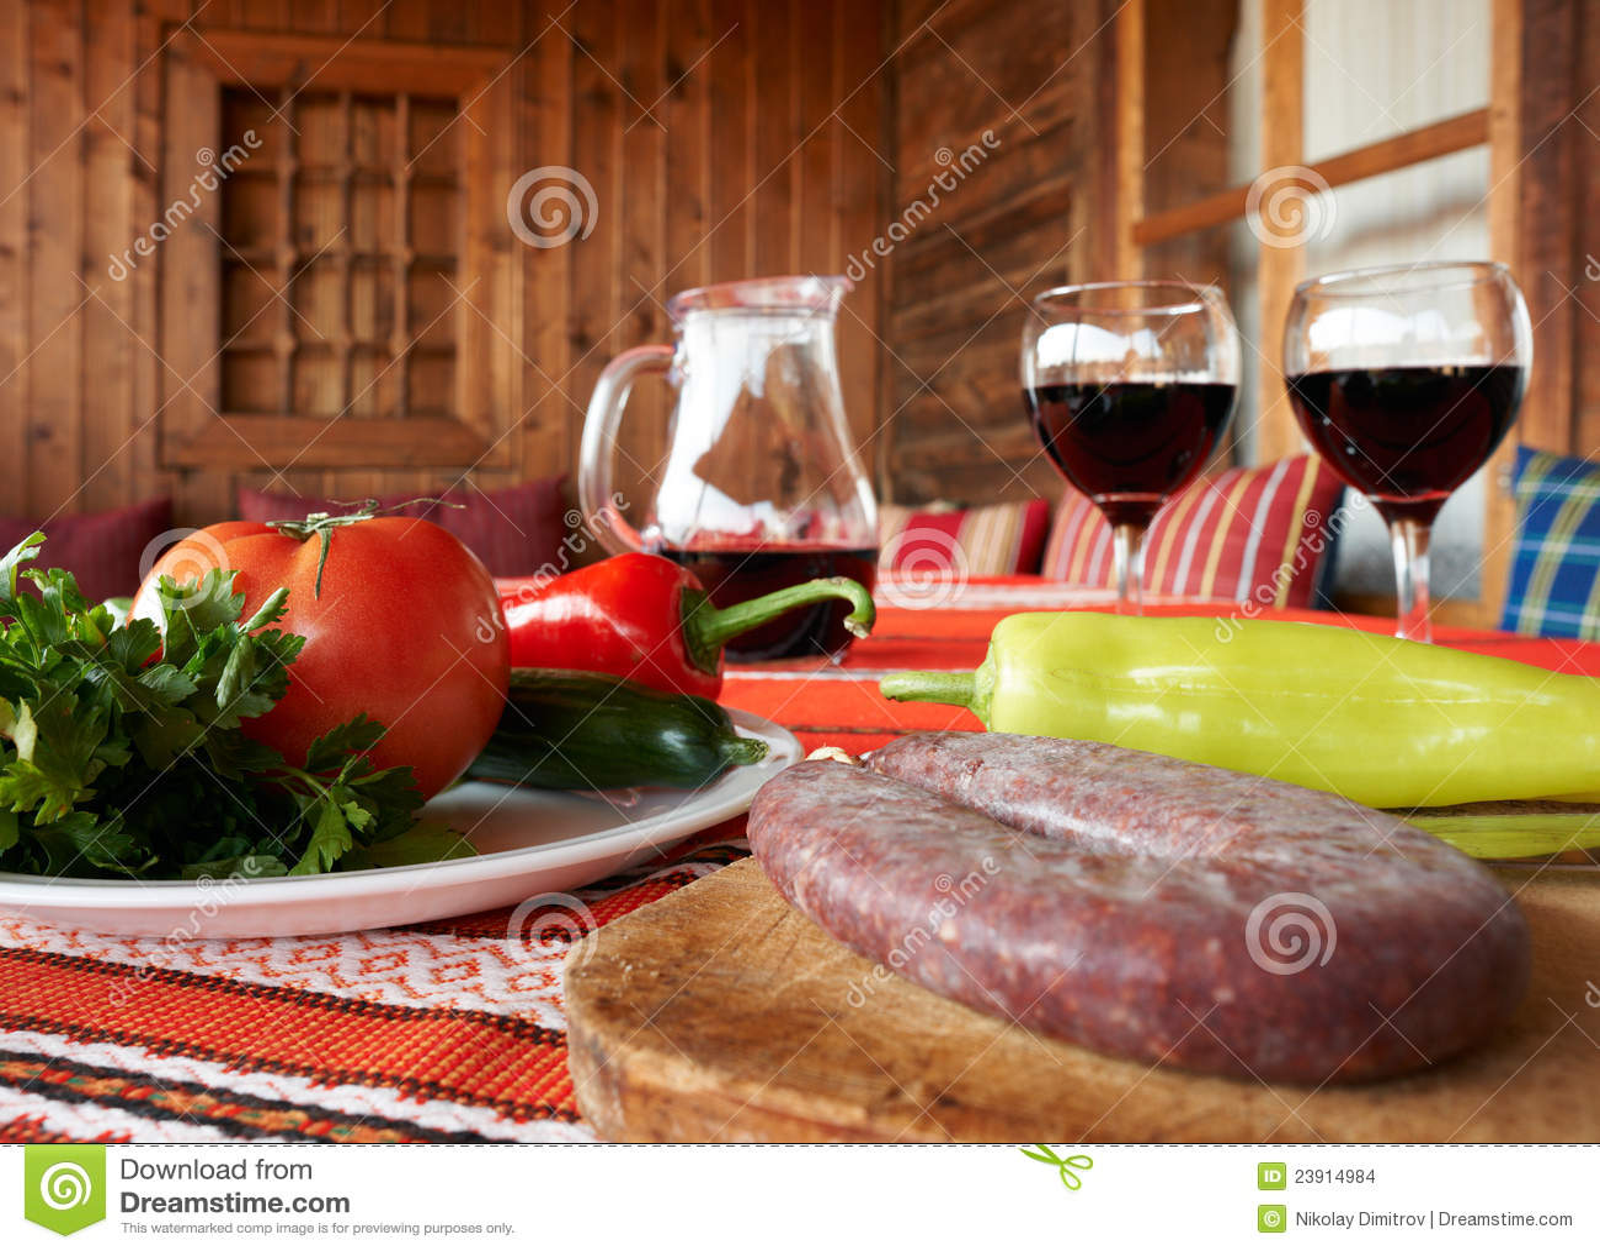 nourriture et vin sur la table images stock image 23914984. Black Bedroom Furniture Sets. Home Design Ideas